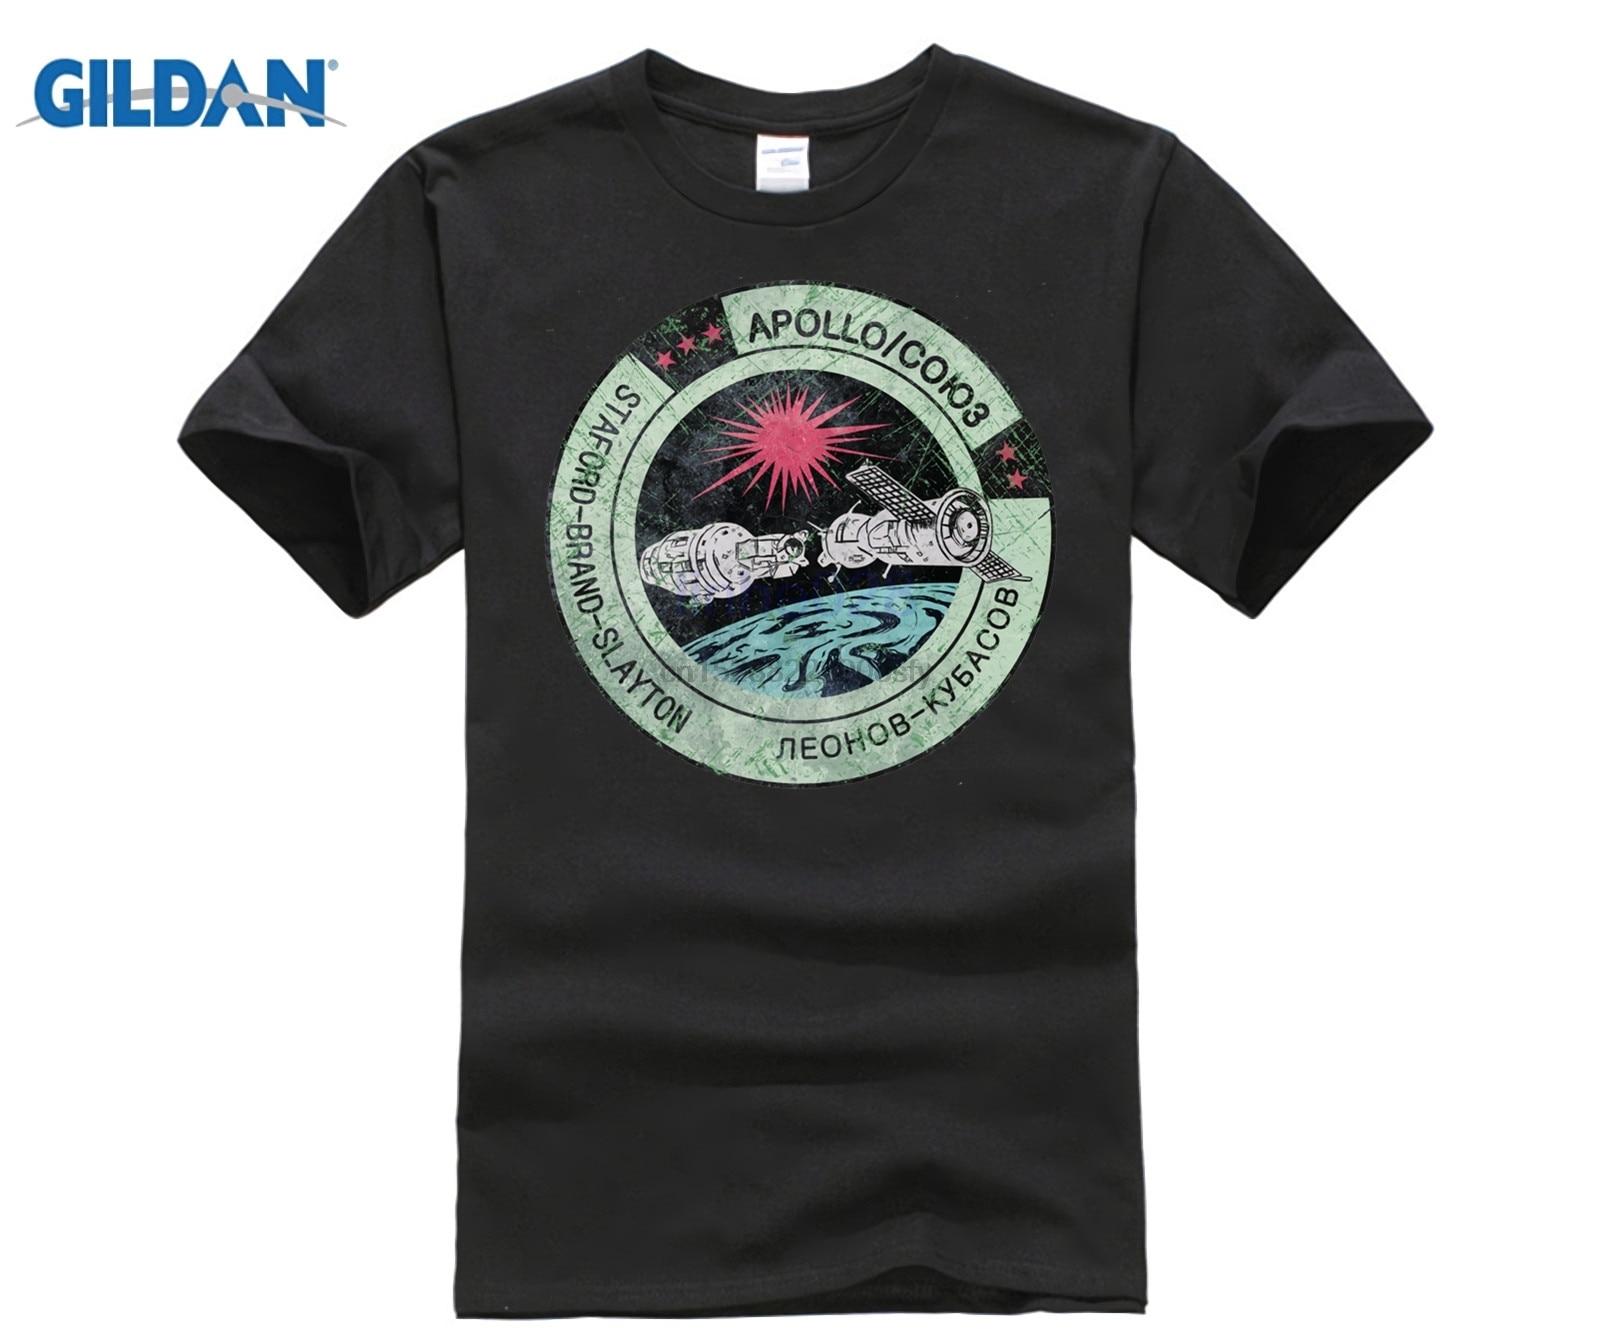 Camiseta Vintage con emblema V02 de Apolo Soyuz